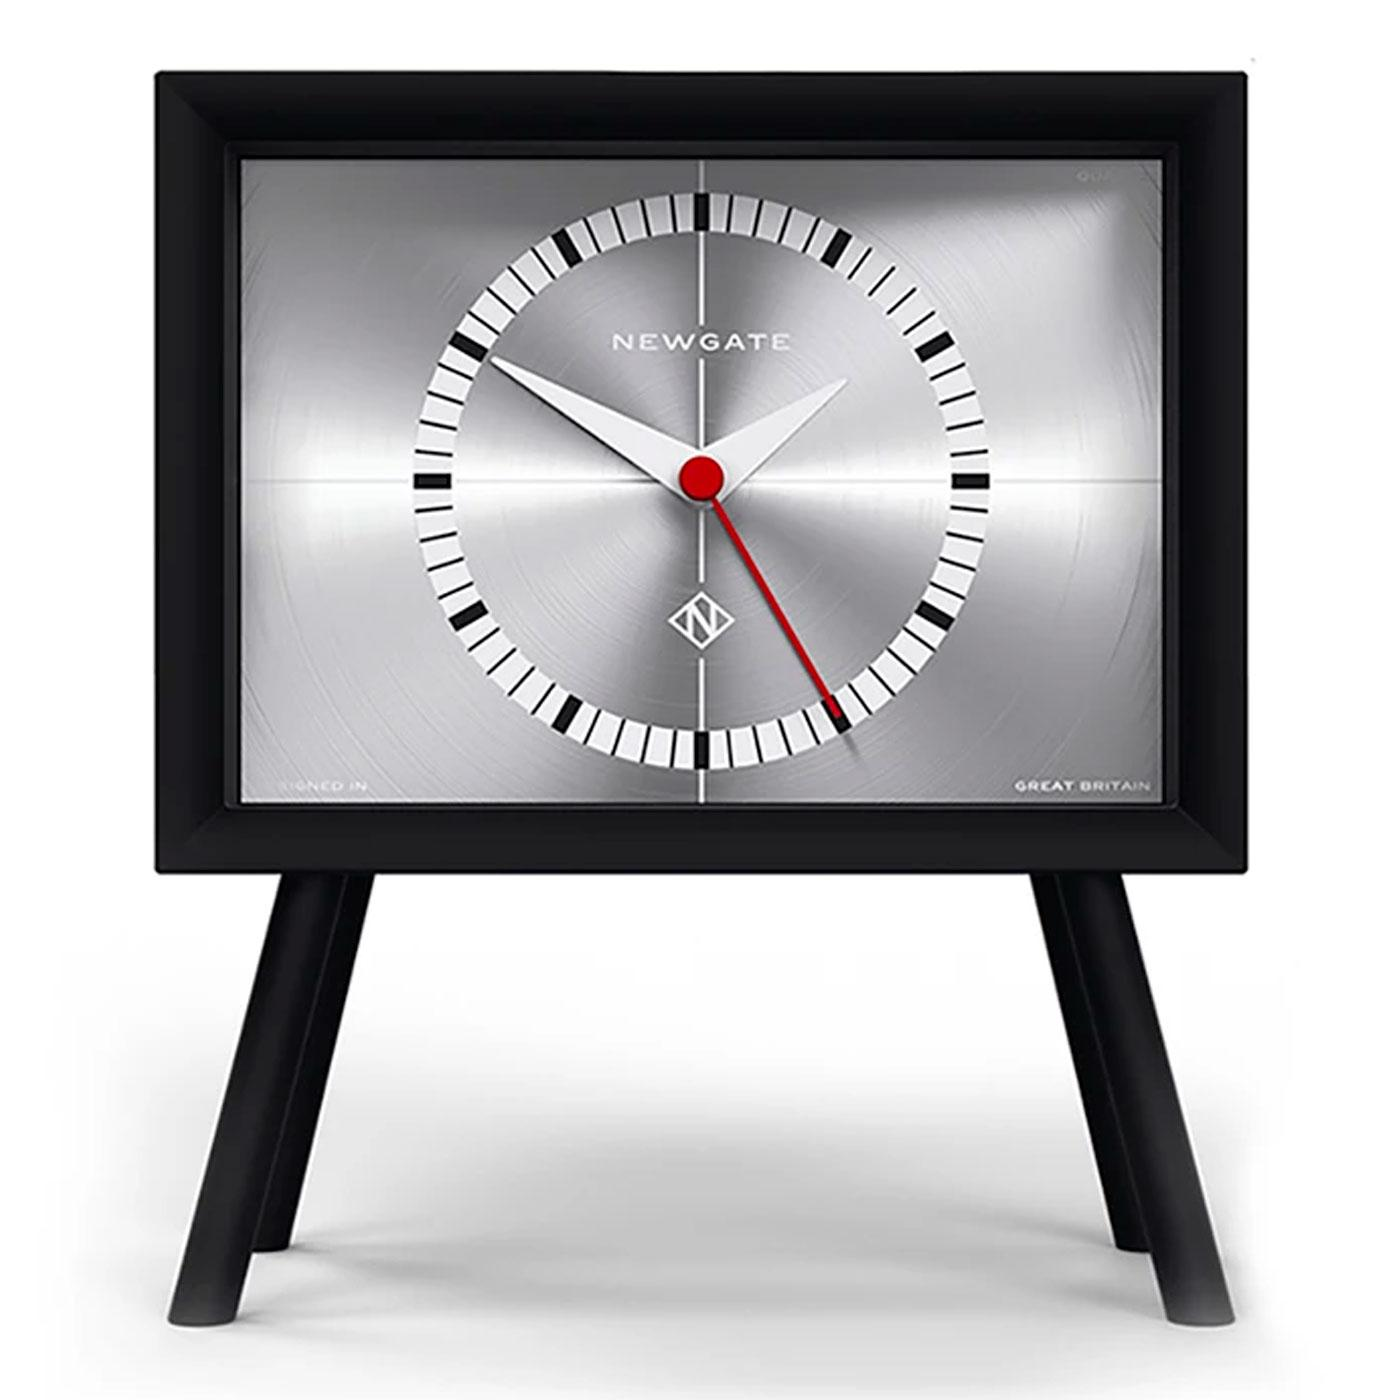 Henry NEWGATE CLOCKS Retro Space Age Mantel Clock